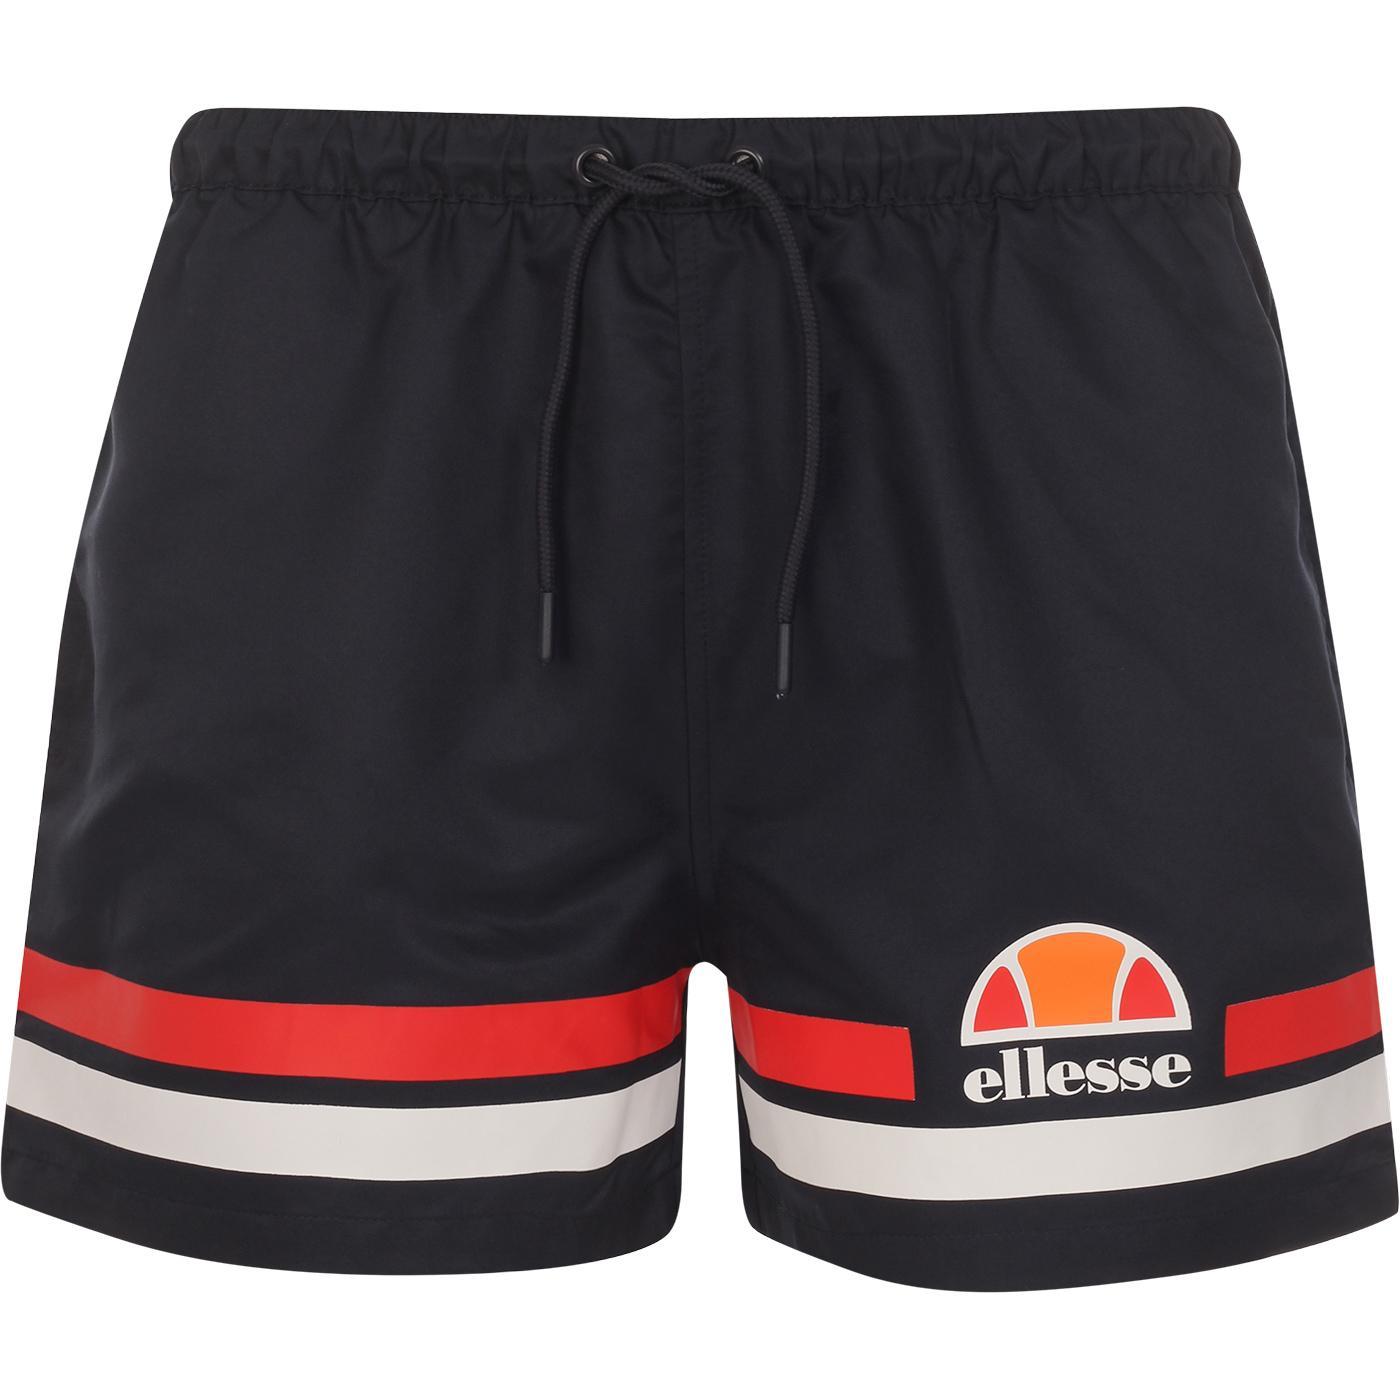 Tello ELLESSE Retro Stripe Swim Shorts (England)